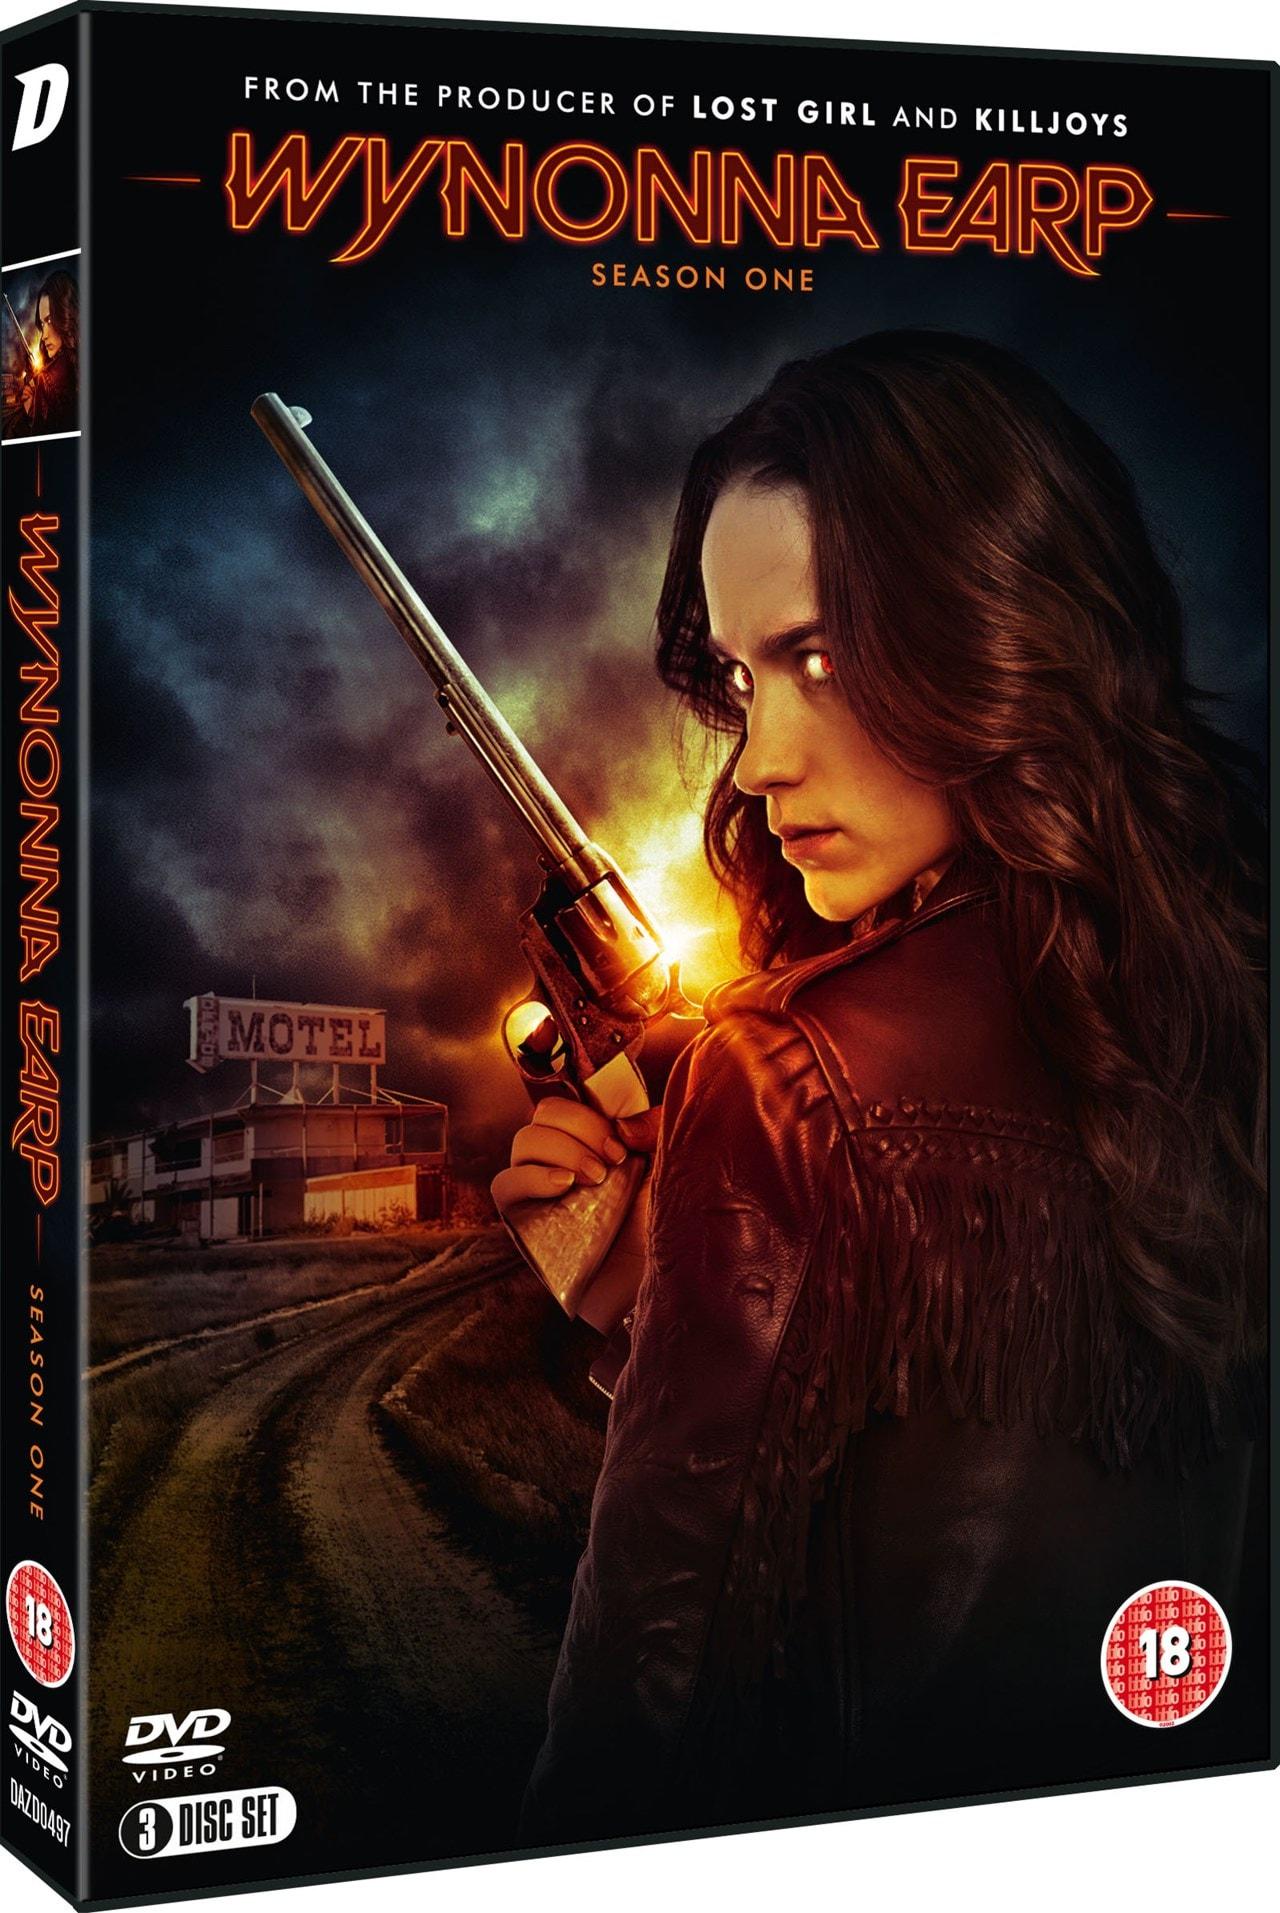 Wynonna Earp Season 1 Dvd Box Set Free Shipping Over 20 Hmv Store